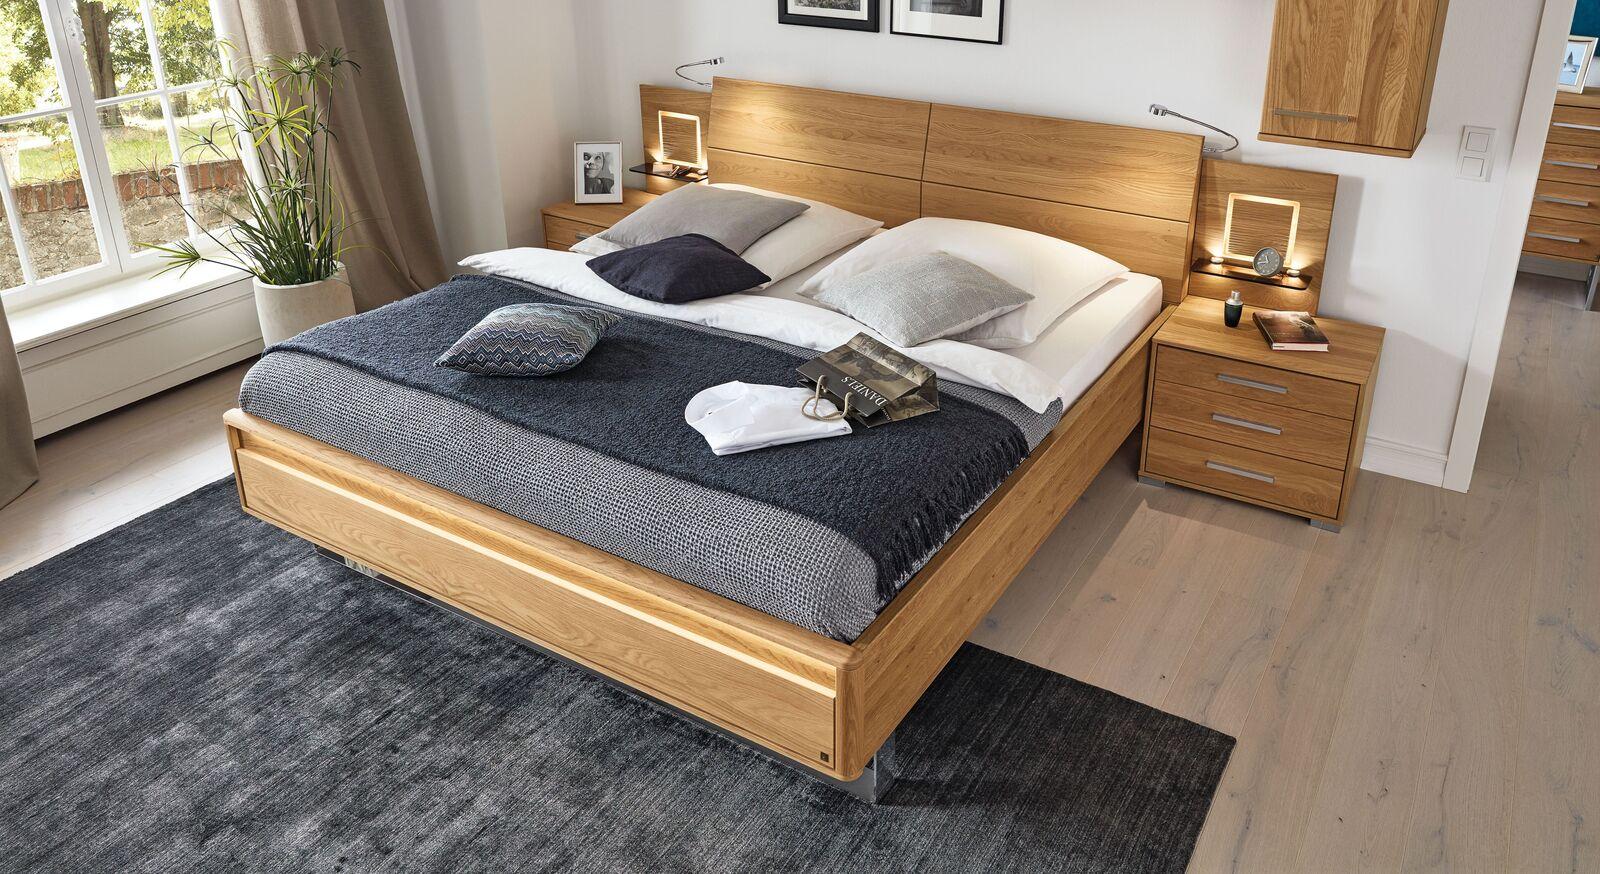 MUSTERRING Bett Samoa mit Chromkufe in Doppelbett-Größe